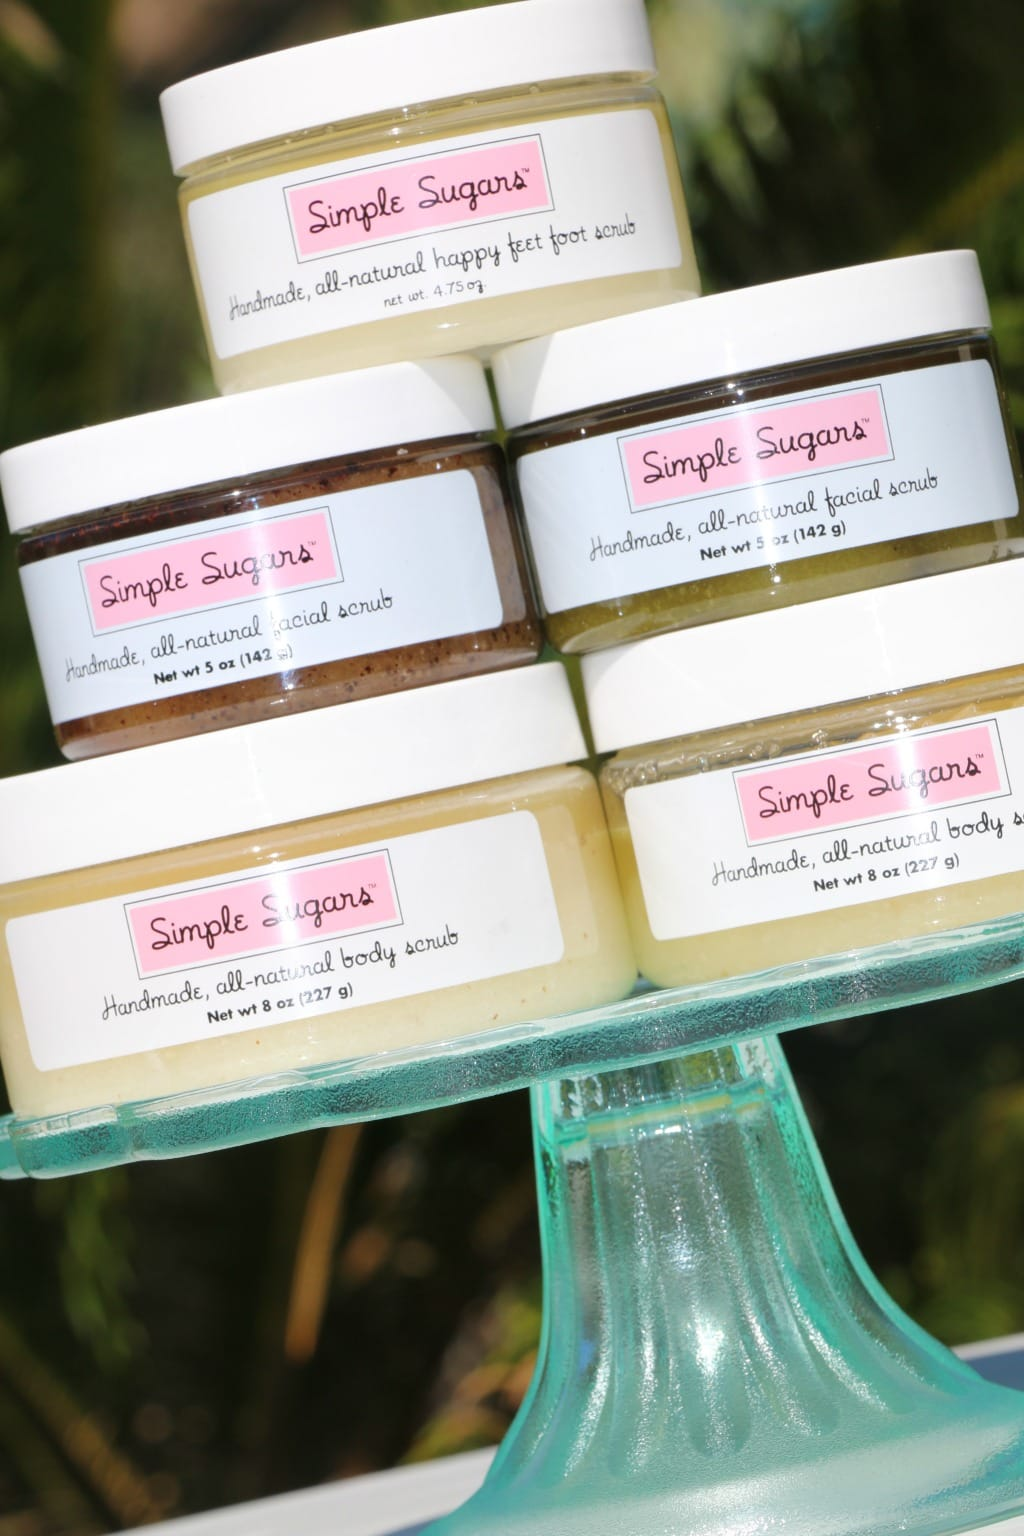 simple sugars skincare